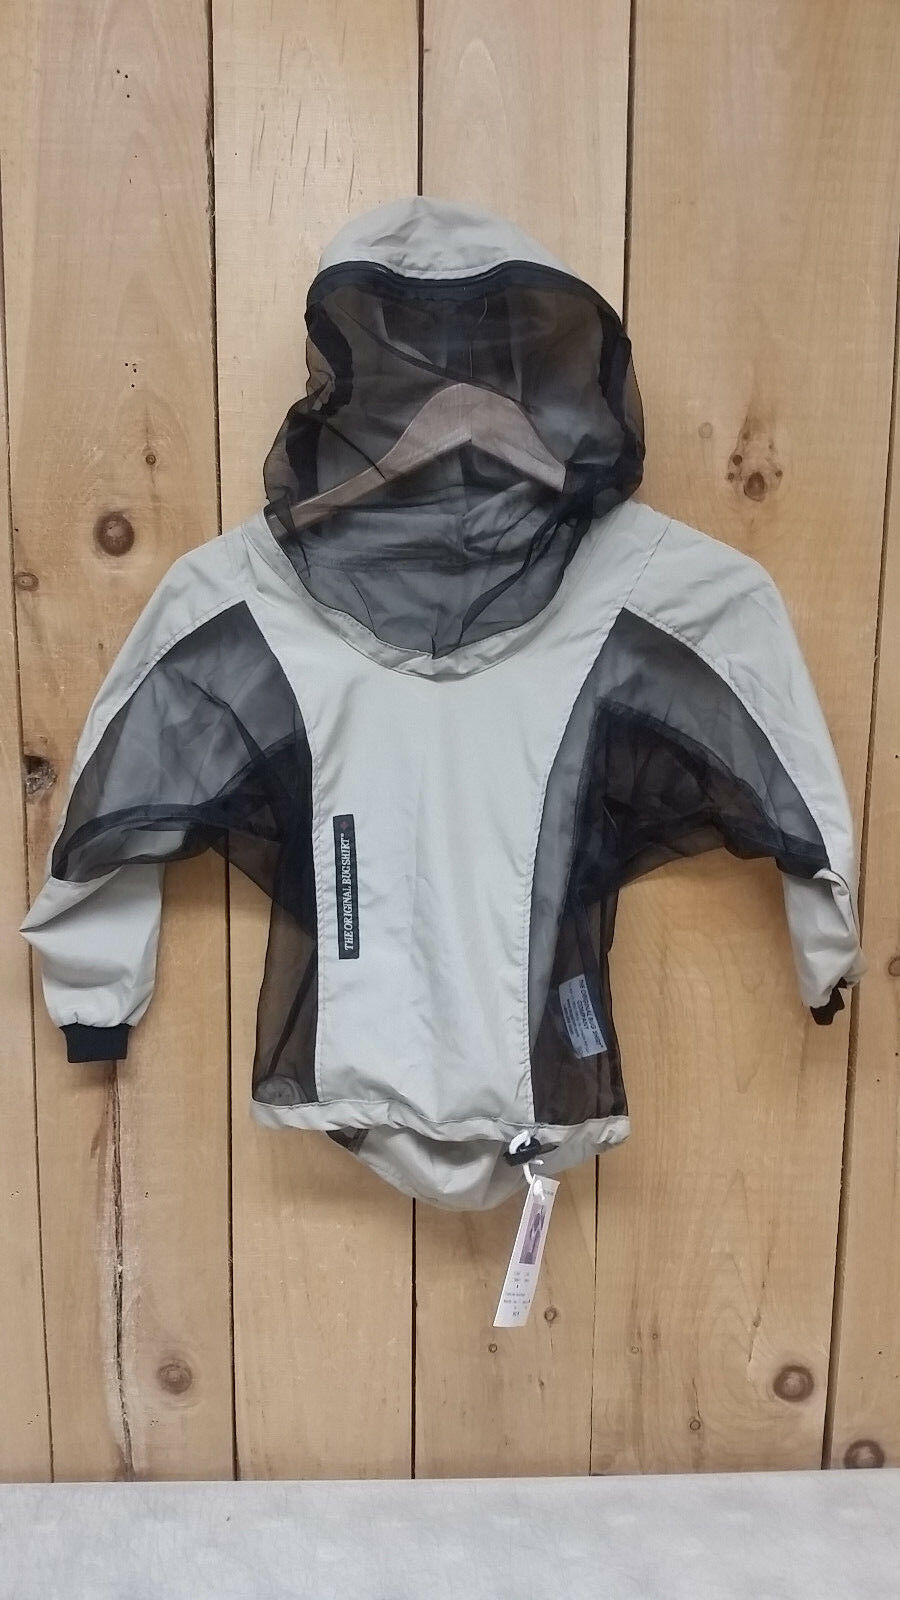 The Original Bug Shirt Kid's Size Small - Elite Microfibre Fabric - Sandstone